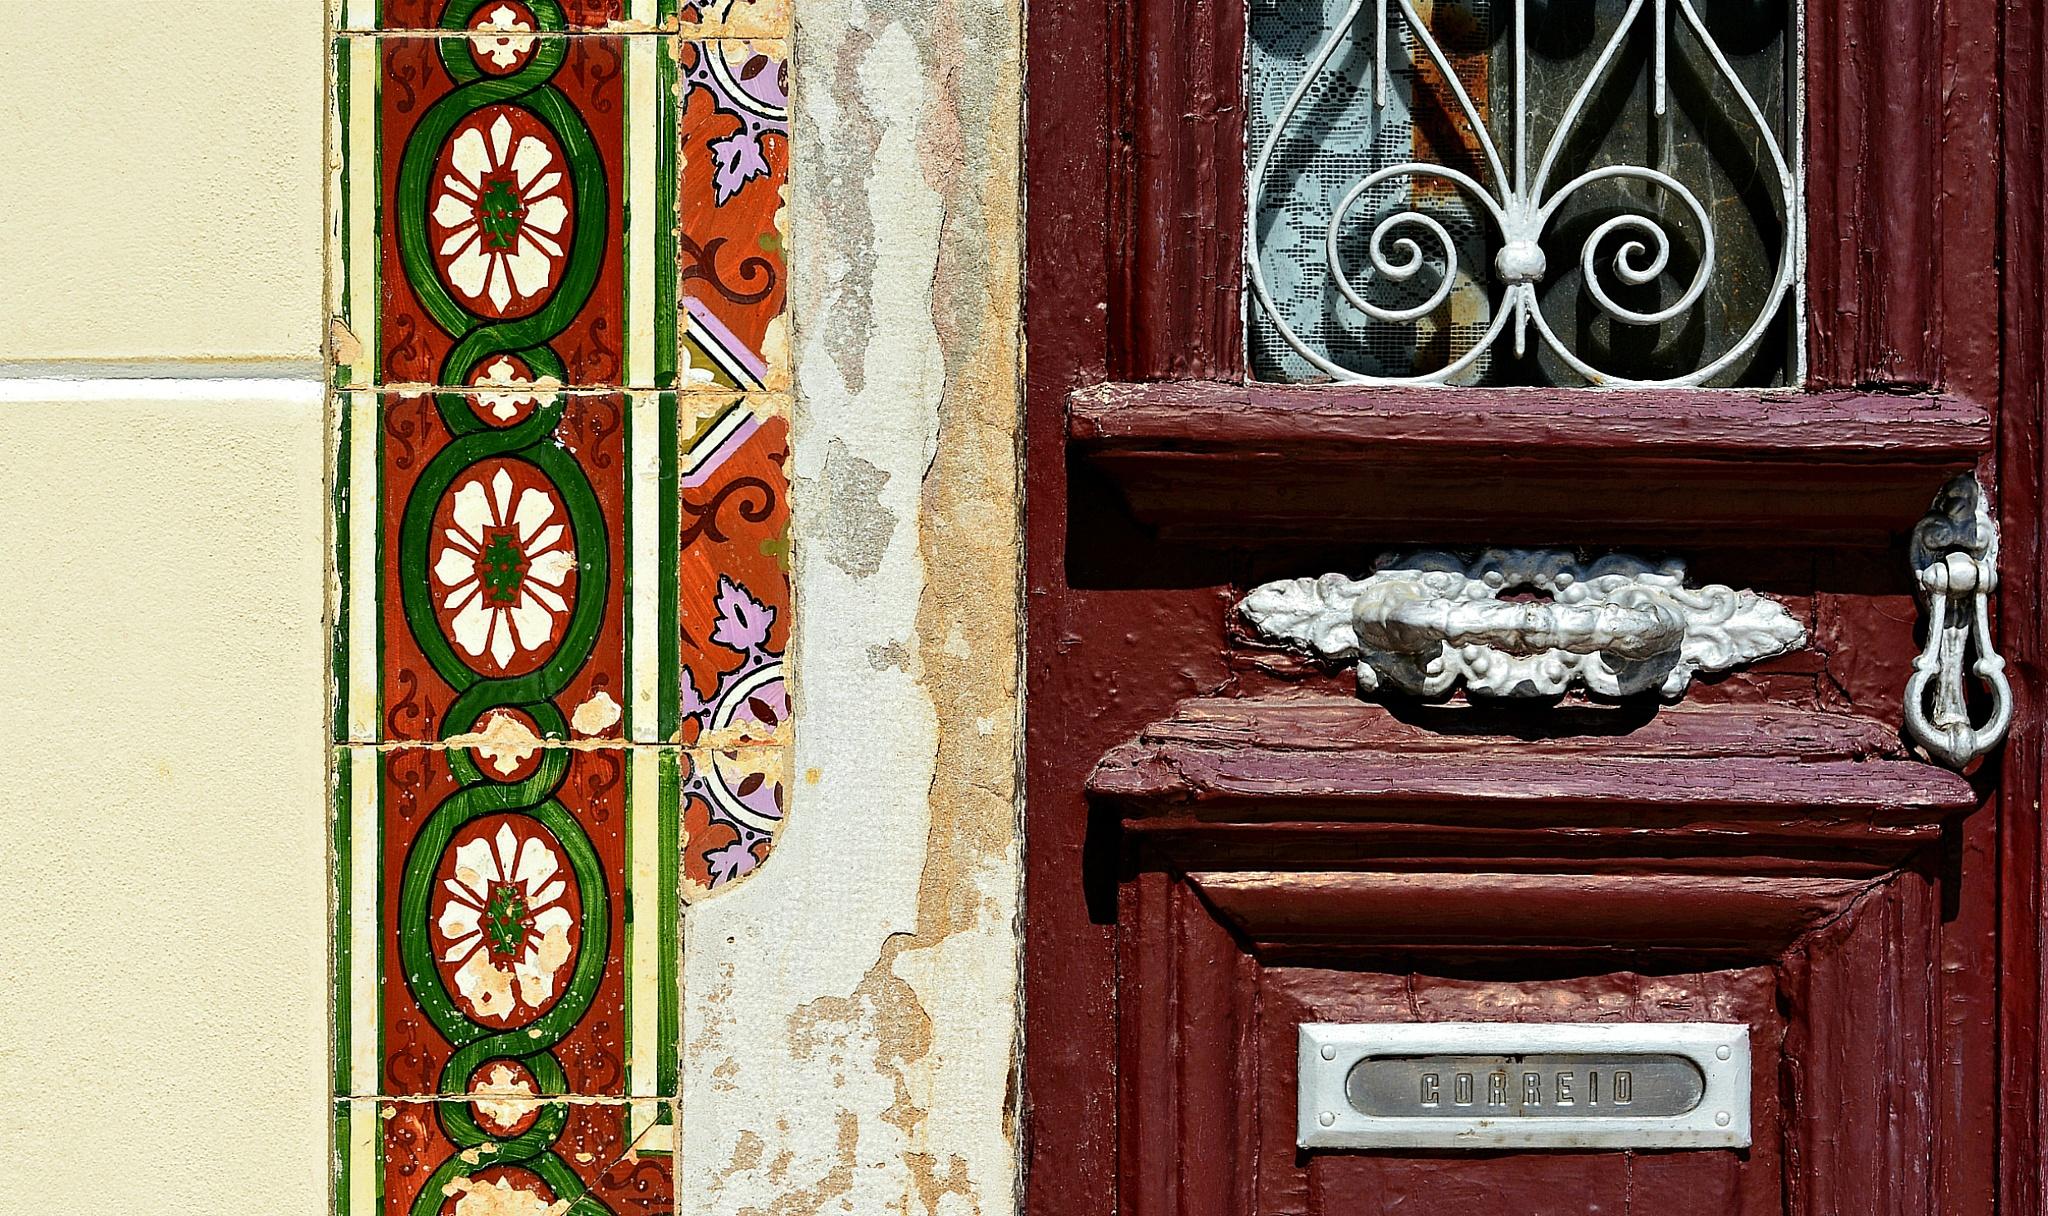 Portuguese heritage by Klaus Van Allen